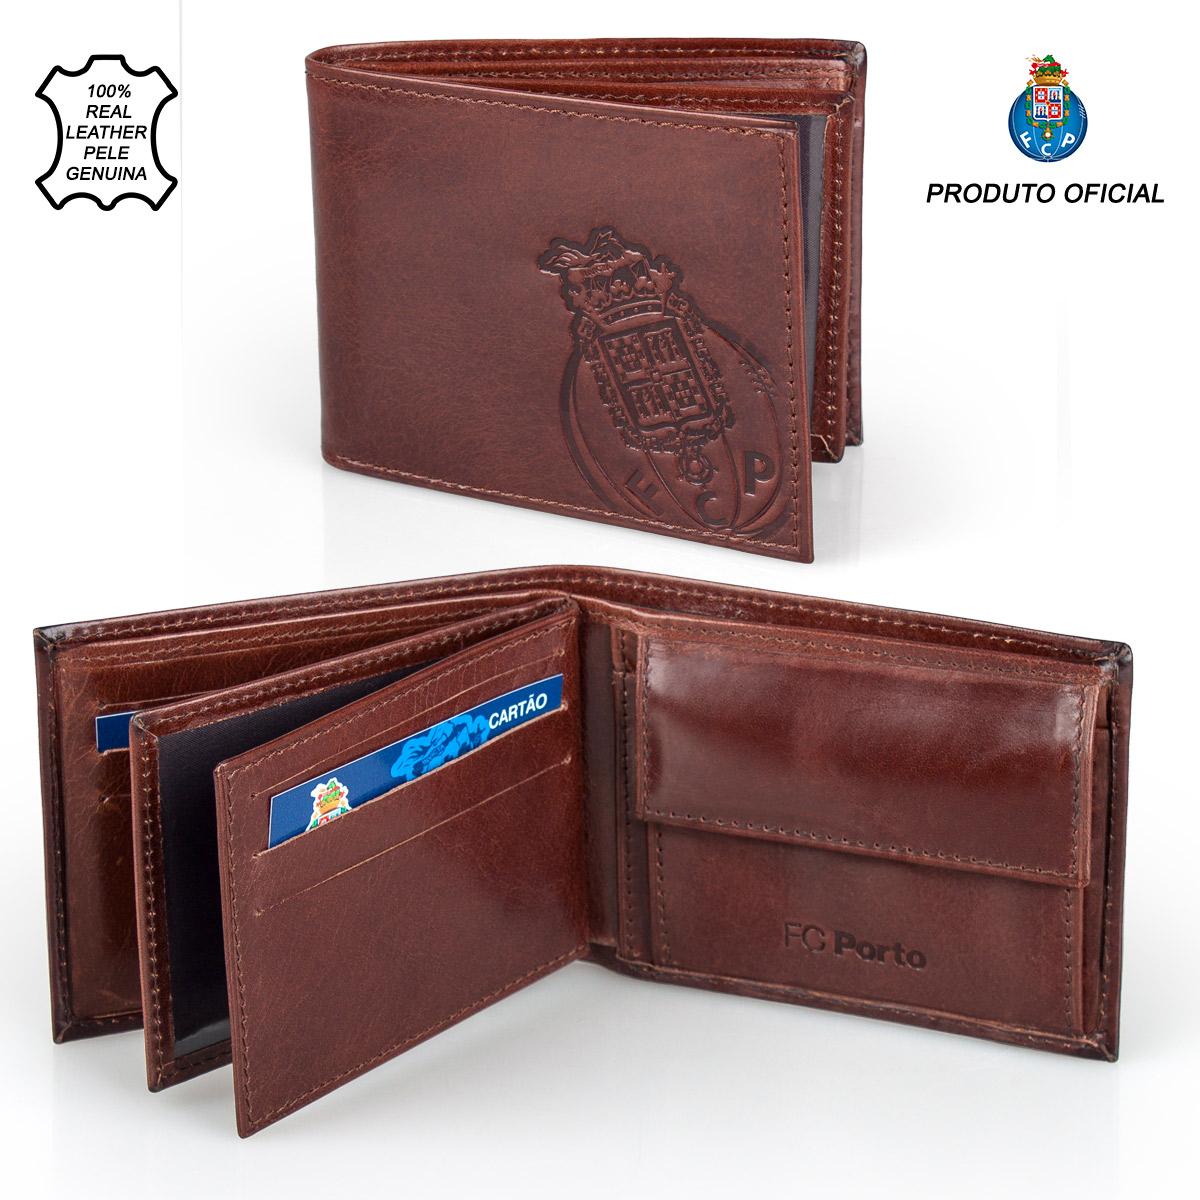 Leather Wallet F.C. PORTO Brown 11.5cm – image 1